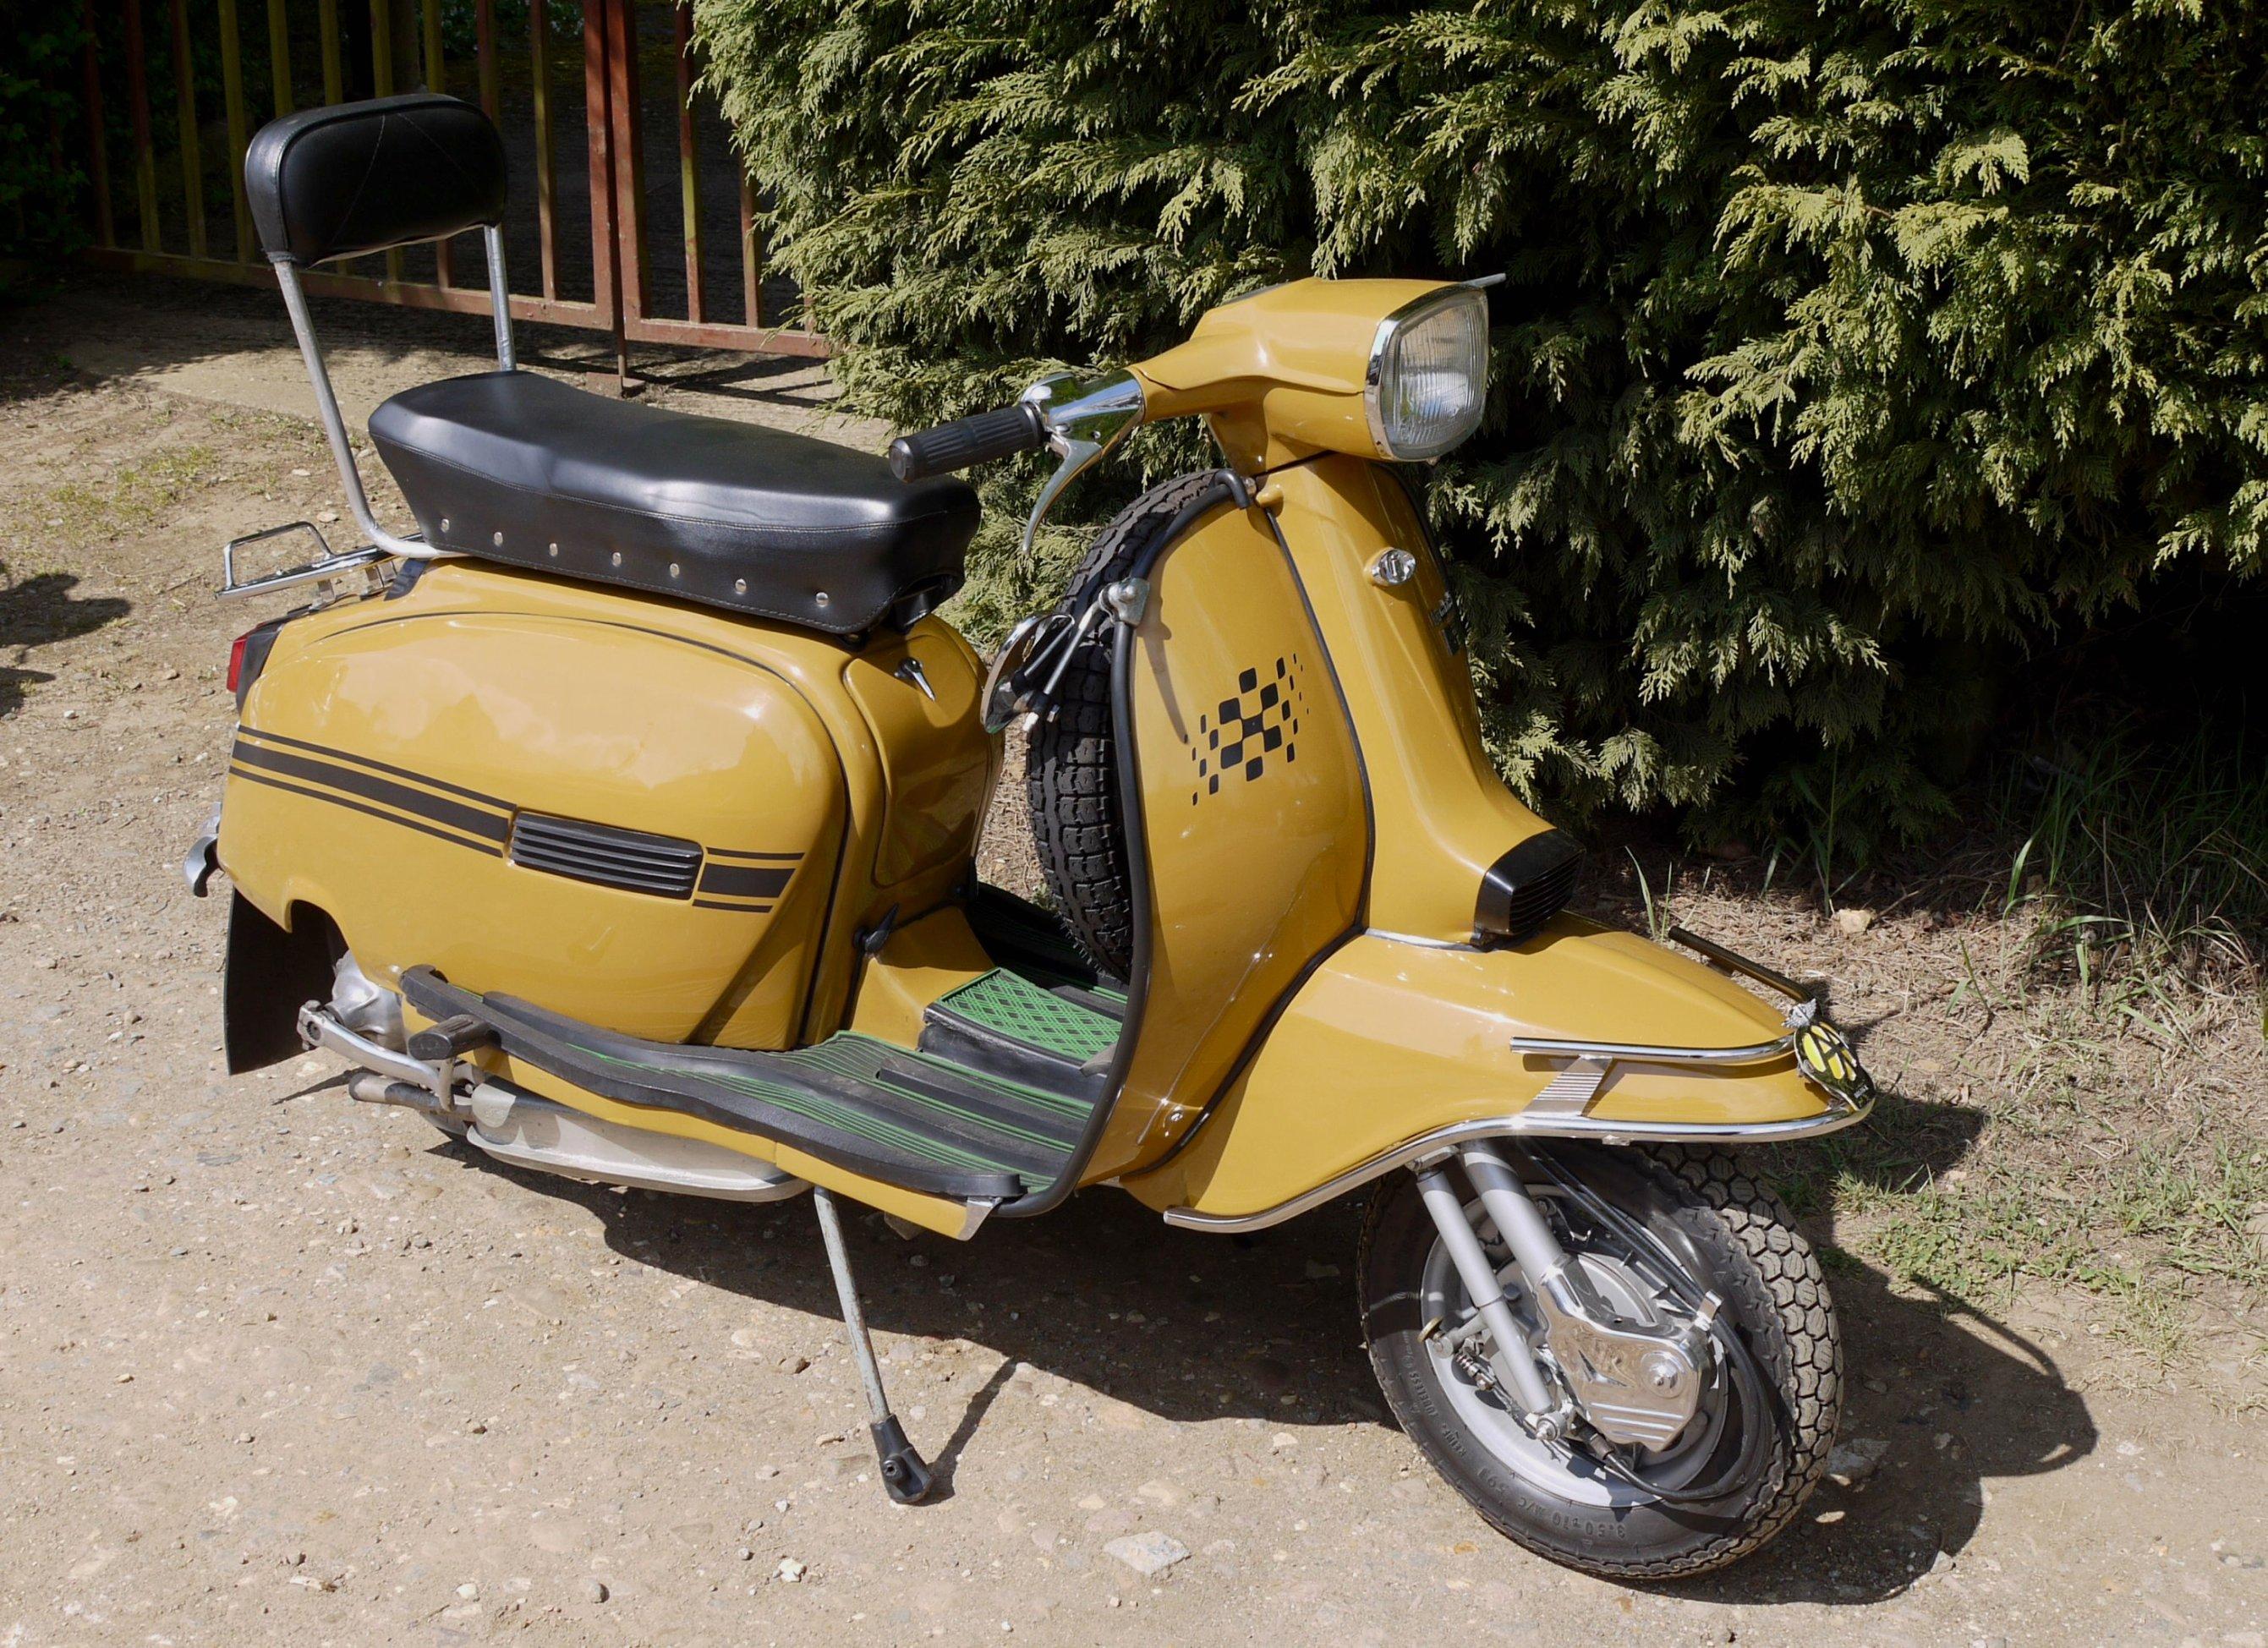 Vespa New Scooter